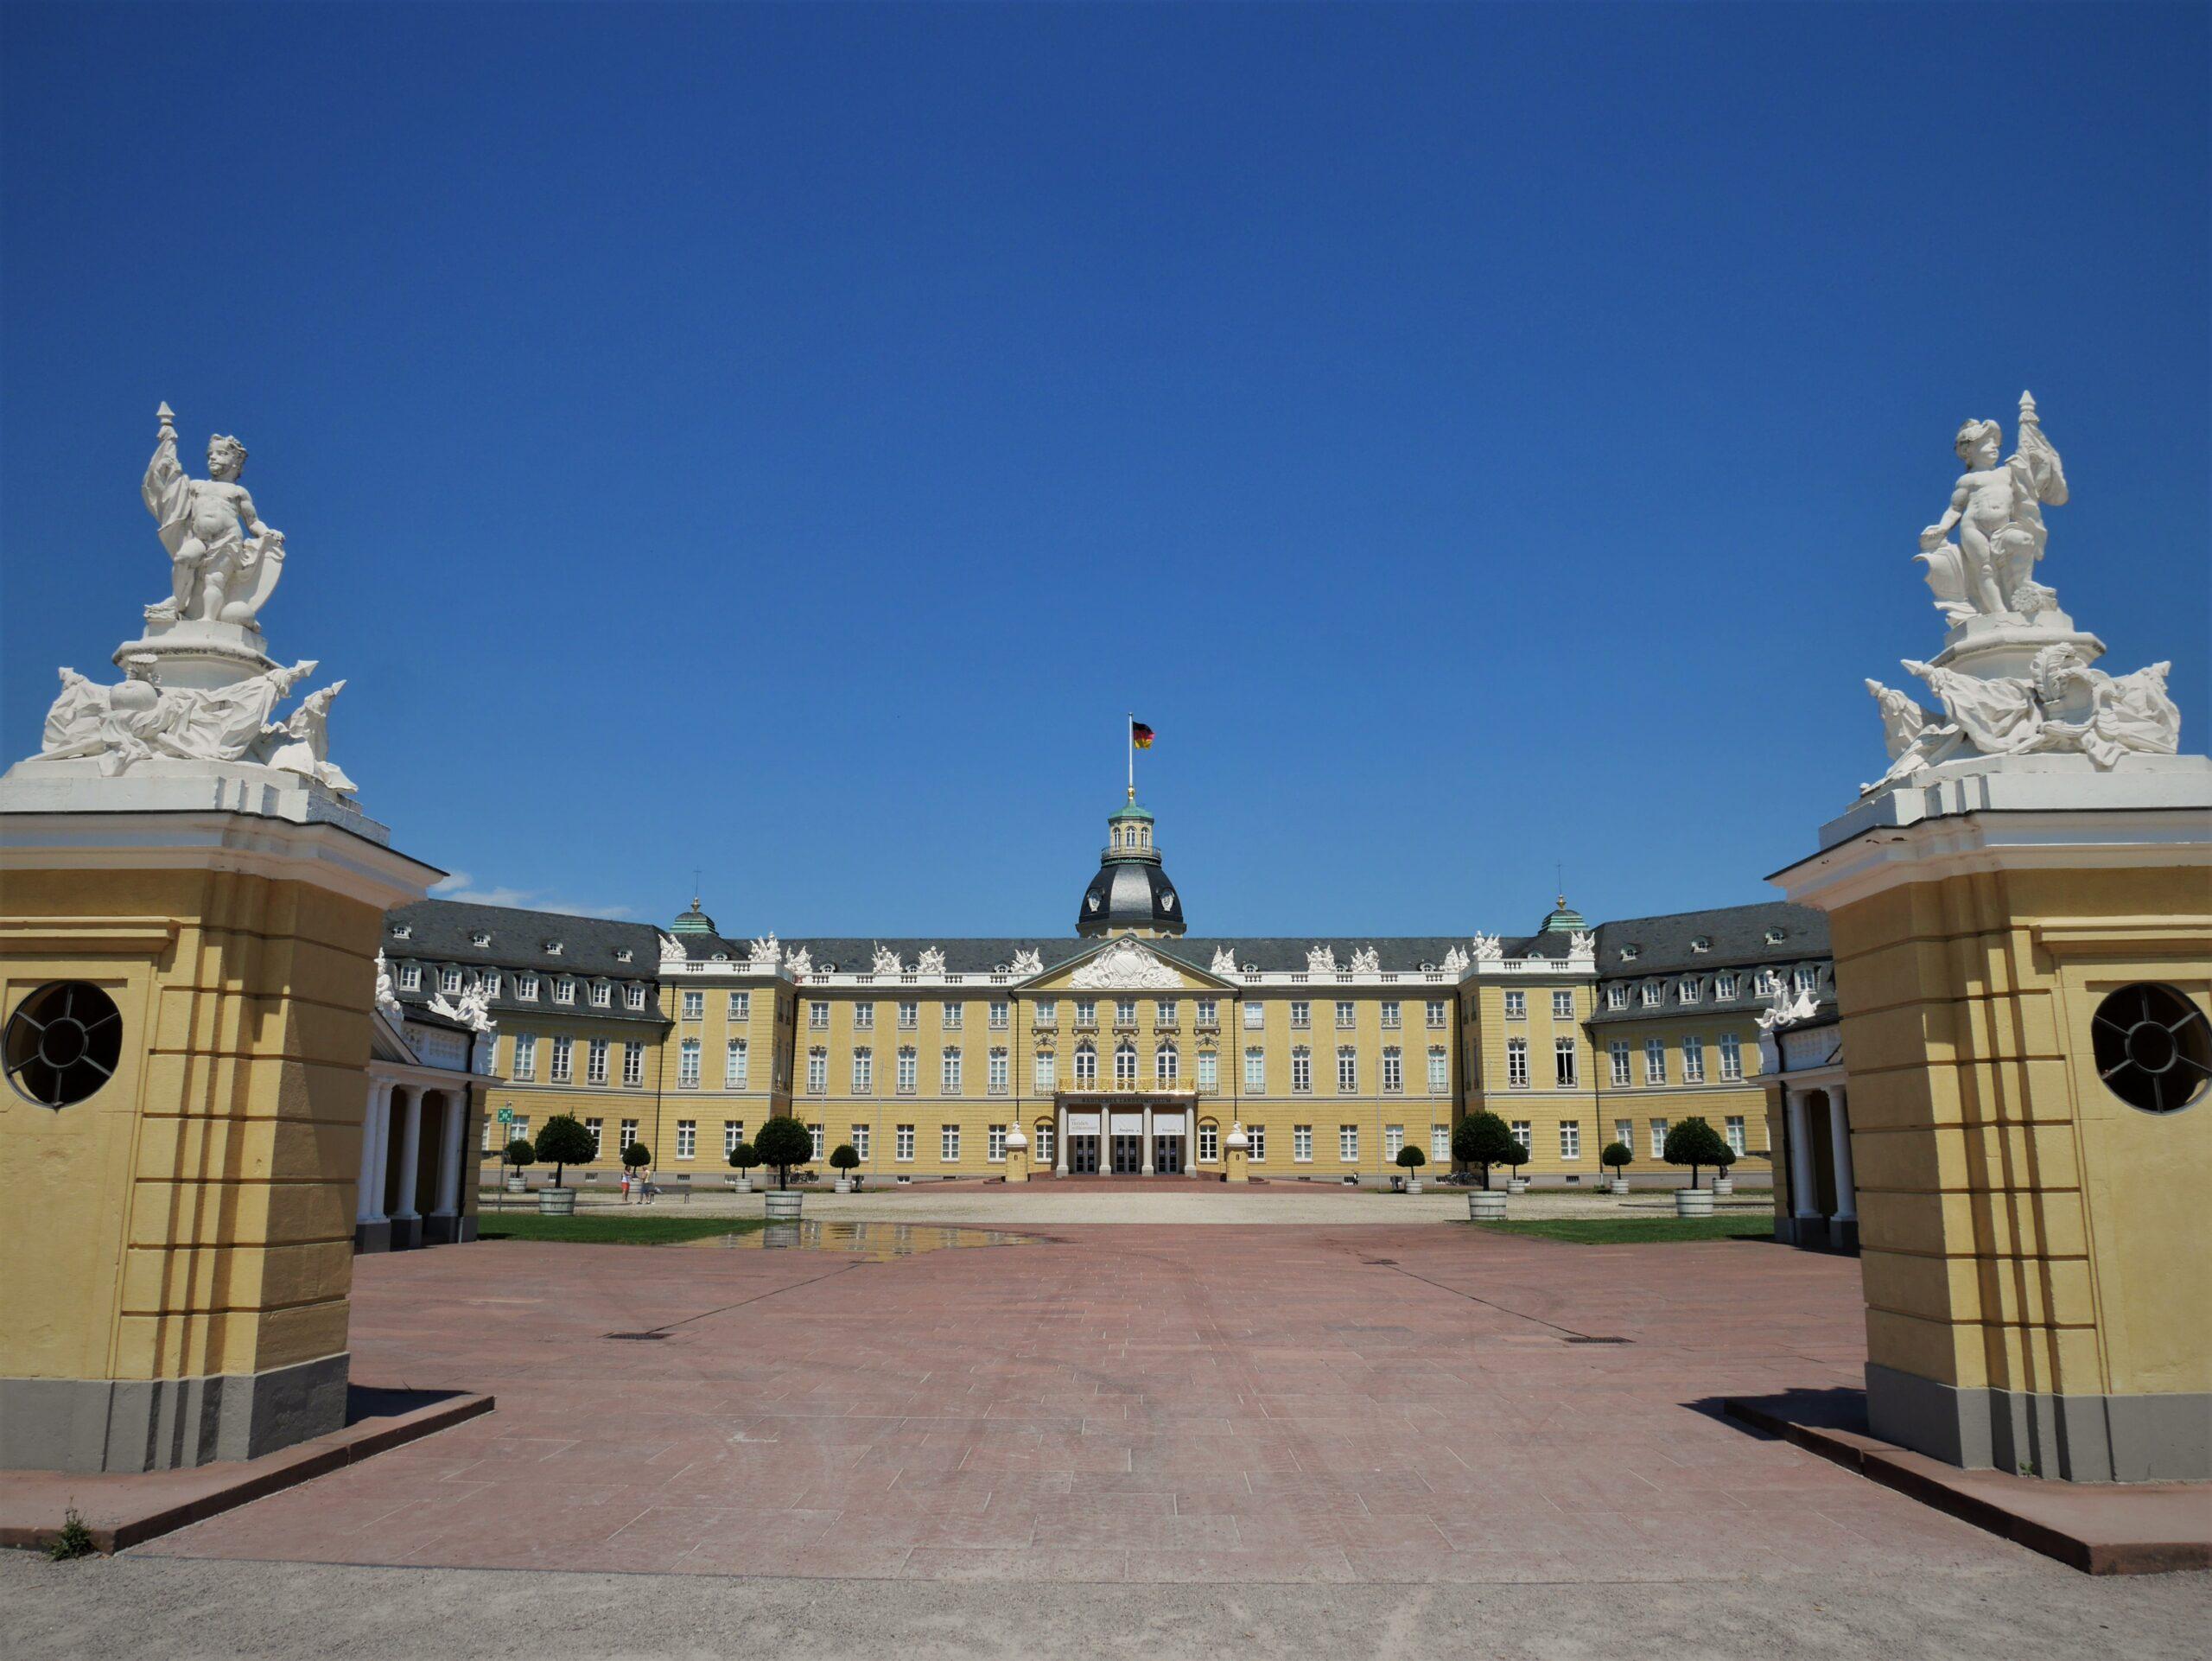 Landesmuseum: Gratis Open-Air-Museumswerkstatt vor dem Schloss!